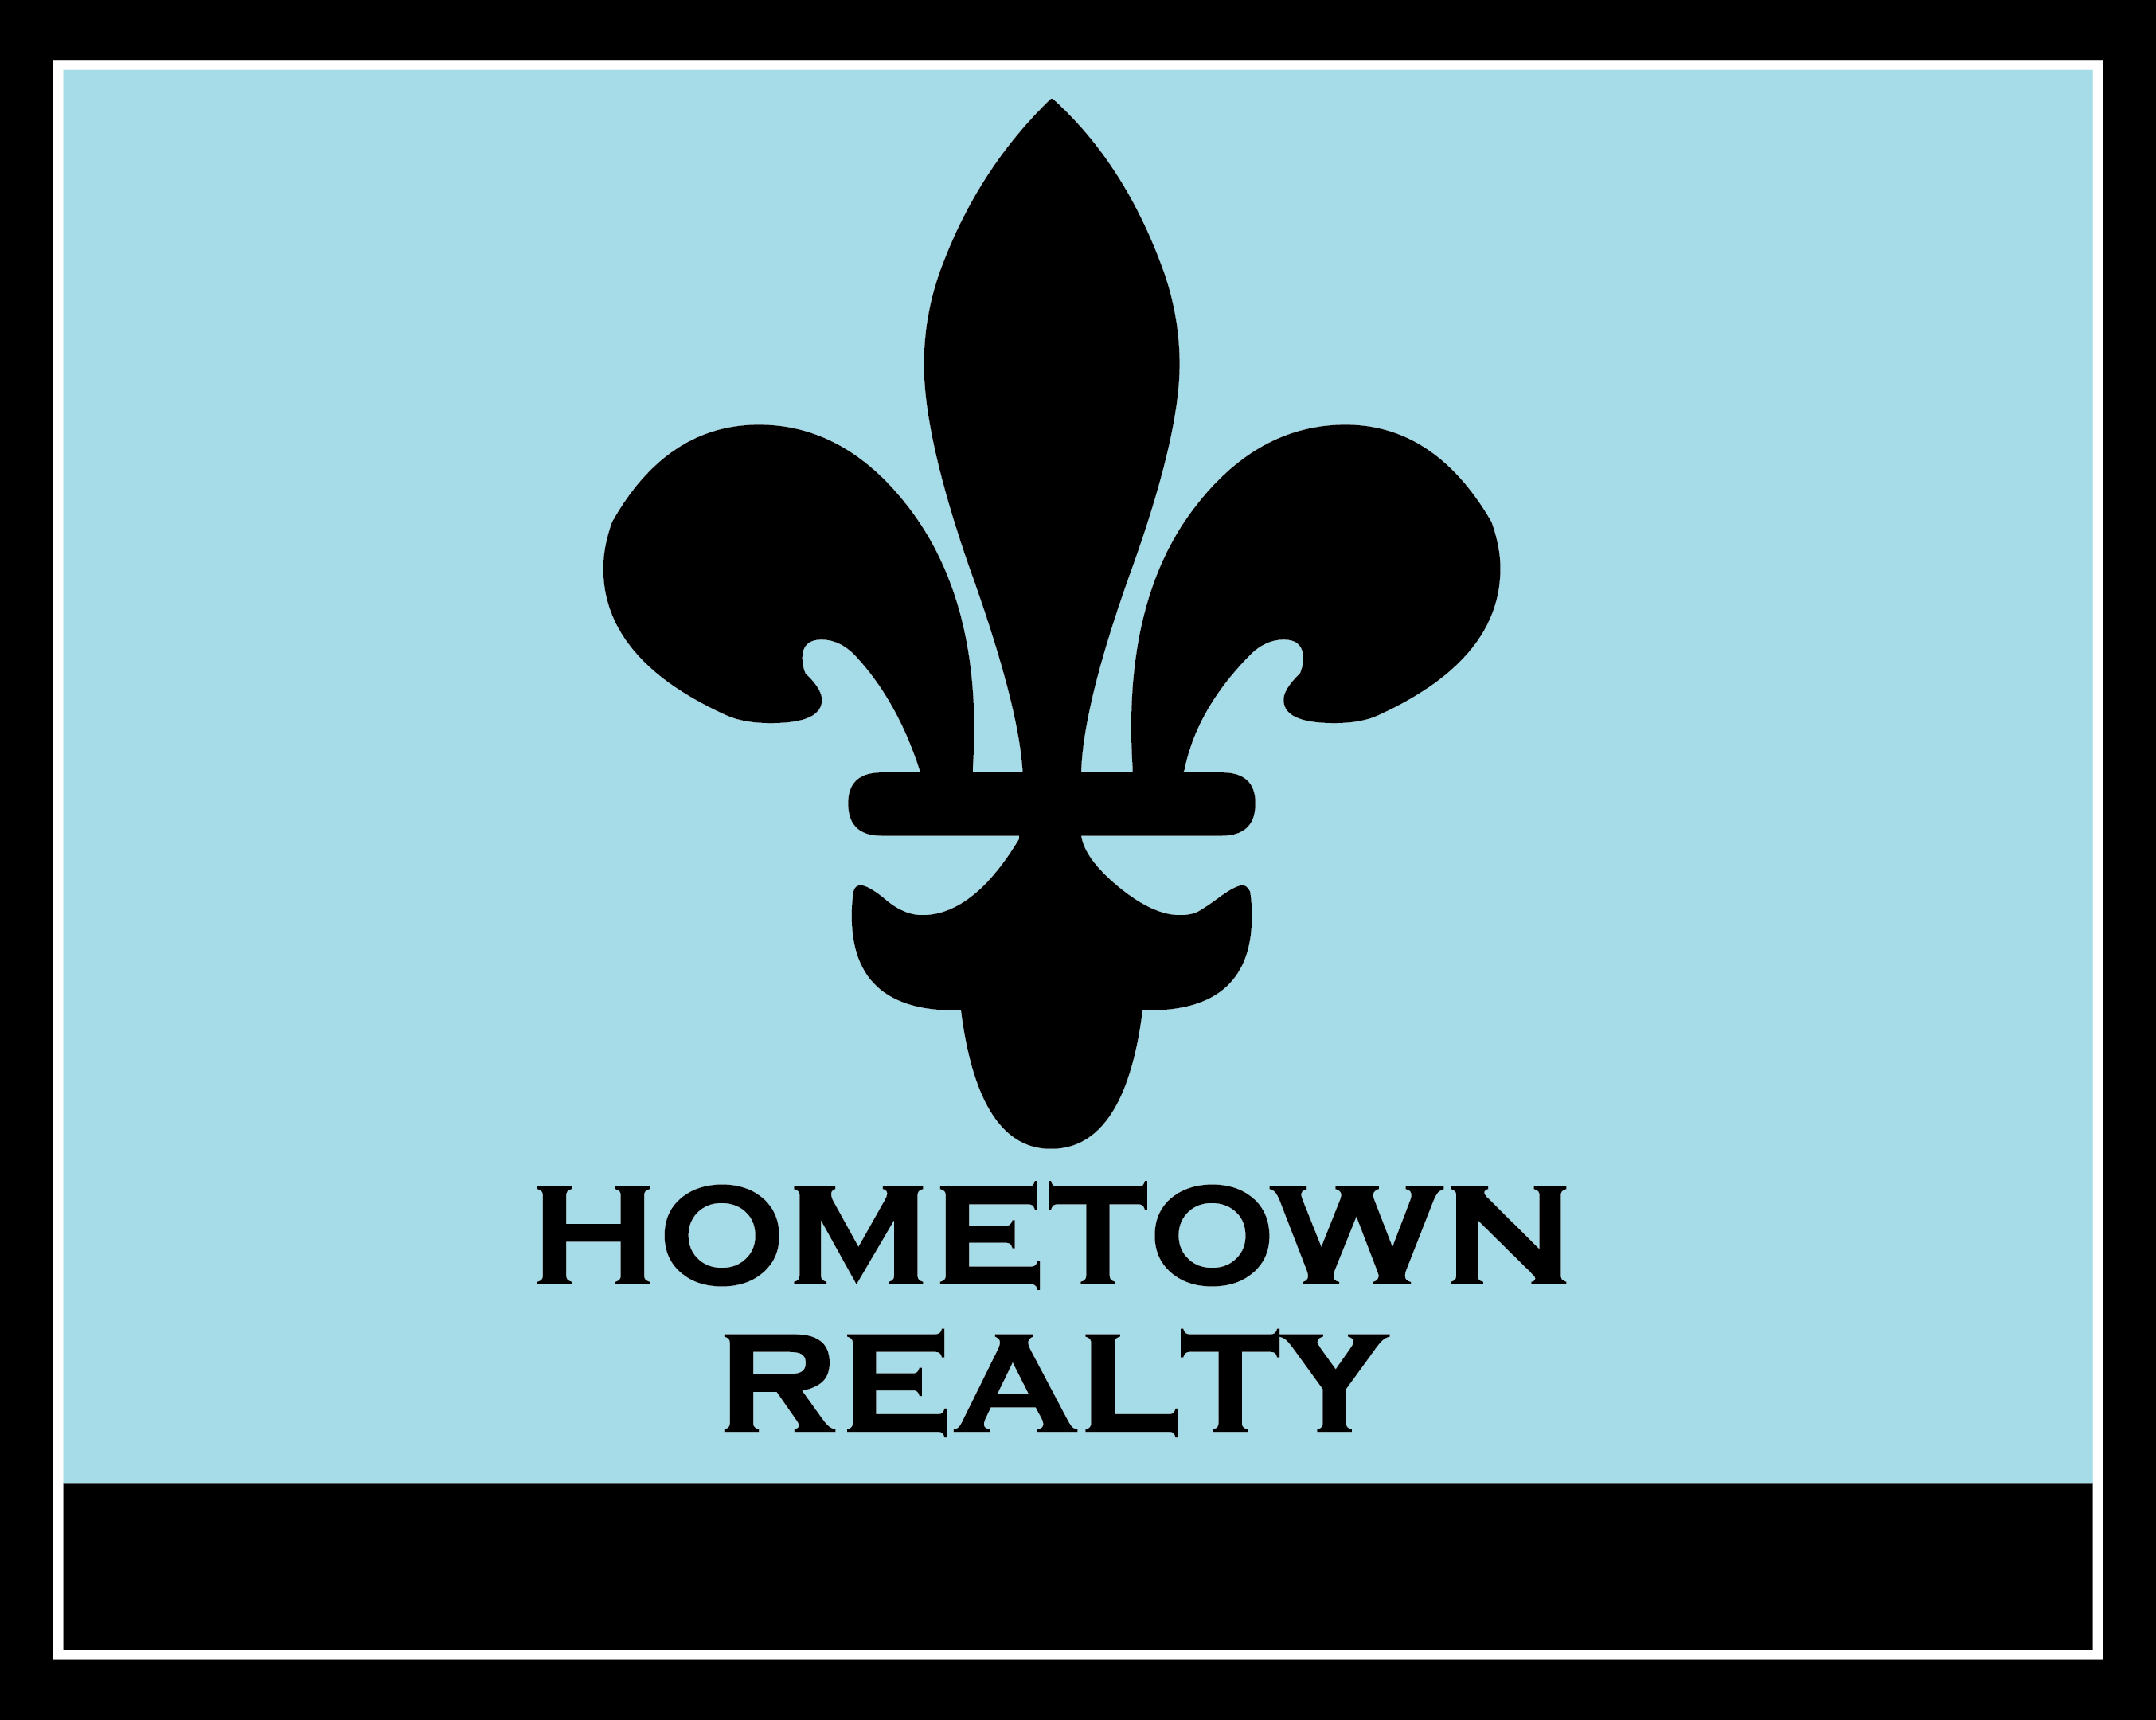 2017 hometown realty backyard tour tickets sun jul 16 2017 at 1